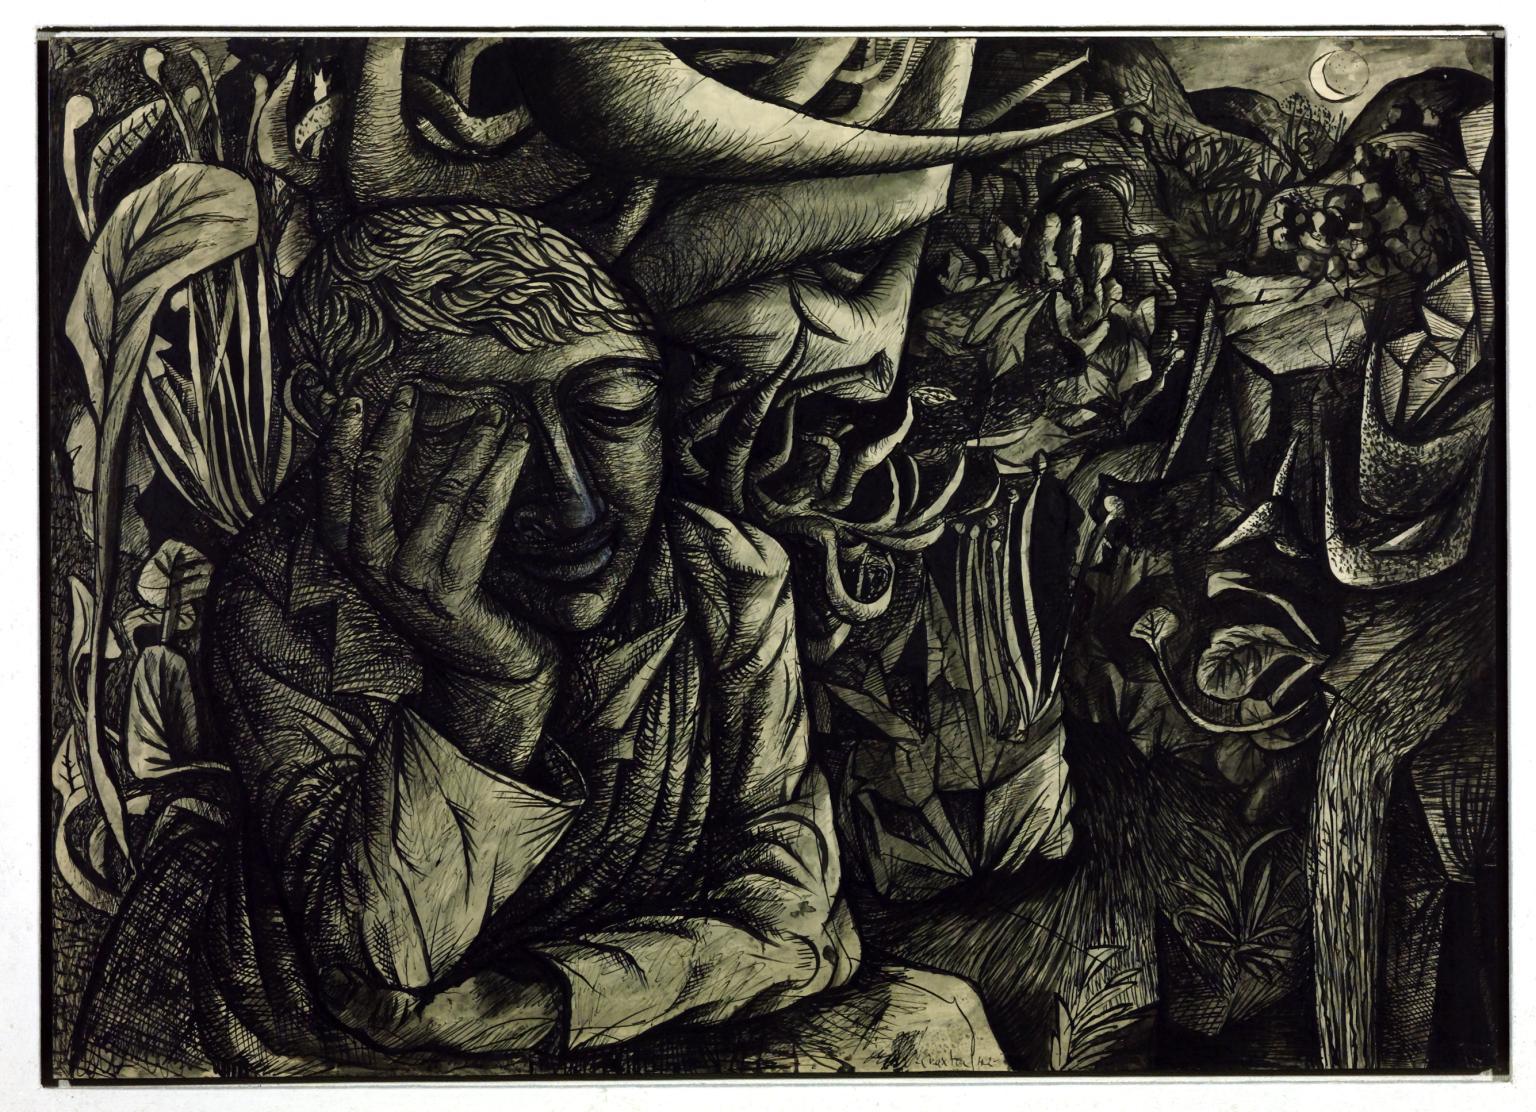 Dreamer in Landscape (1942) - John Craxton